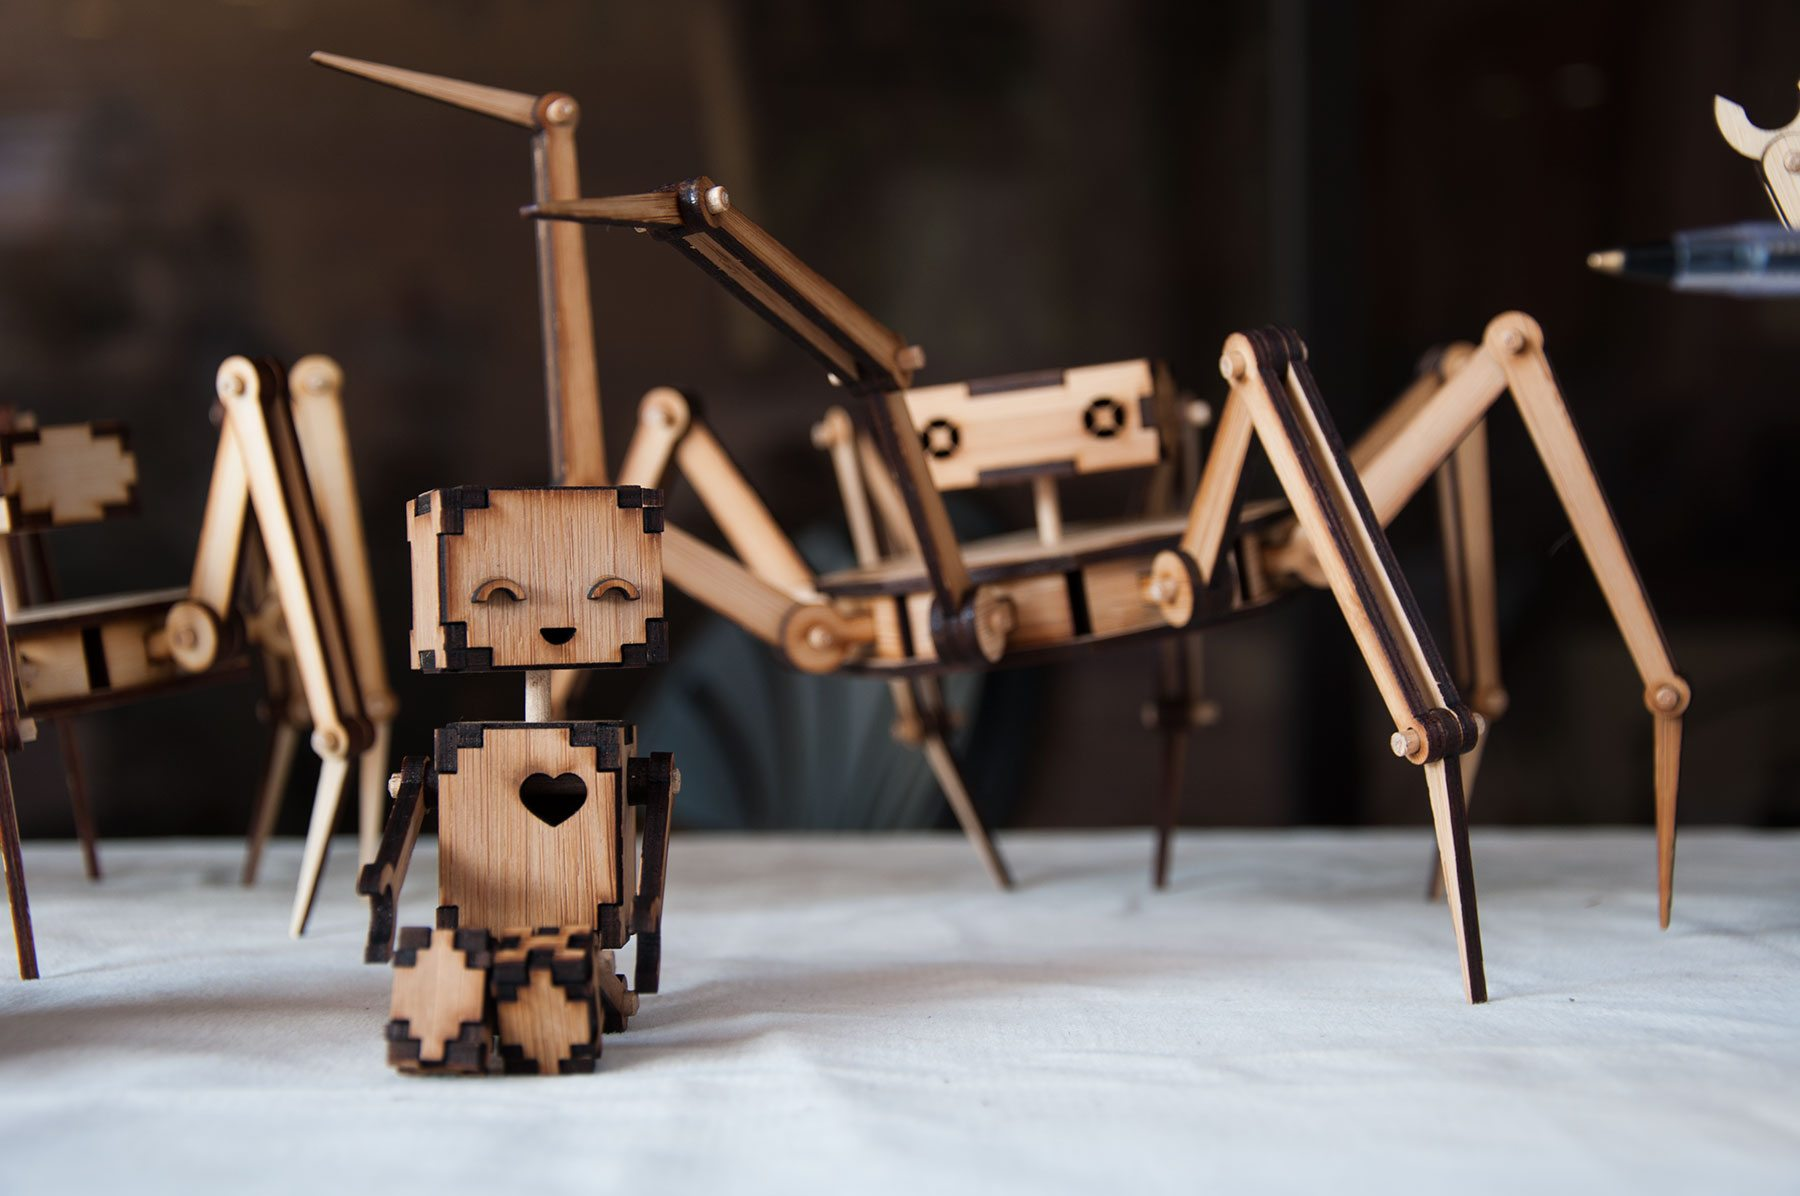 Kickstarter: RoboMustache's Unique Bamboo Robot Kits